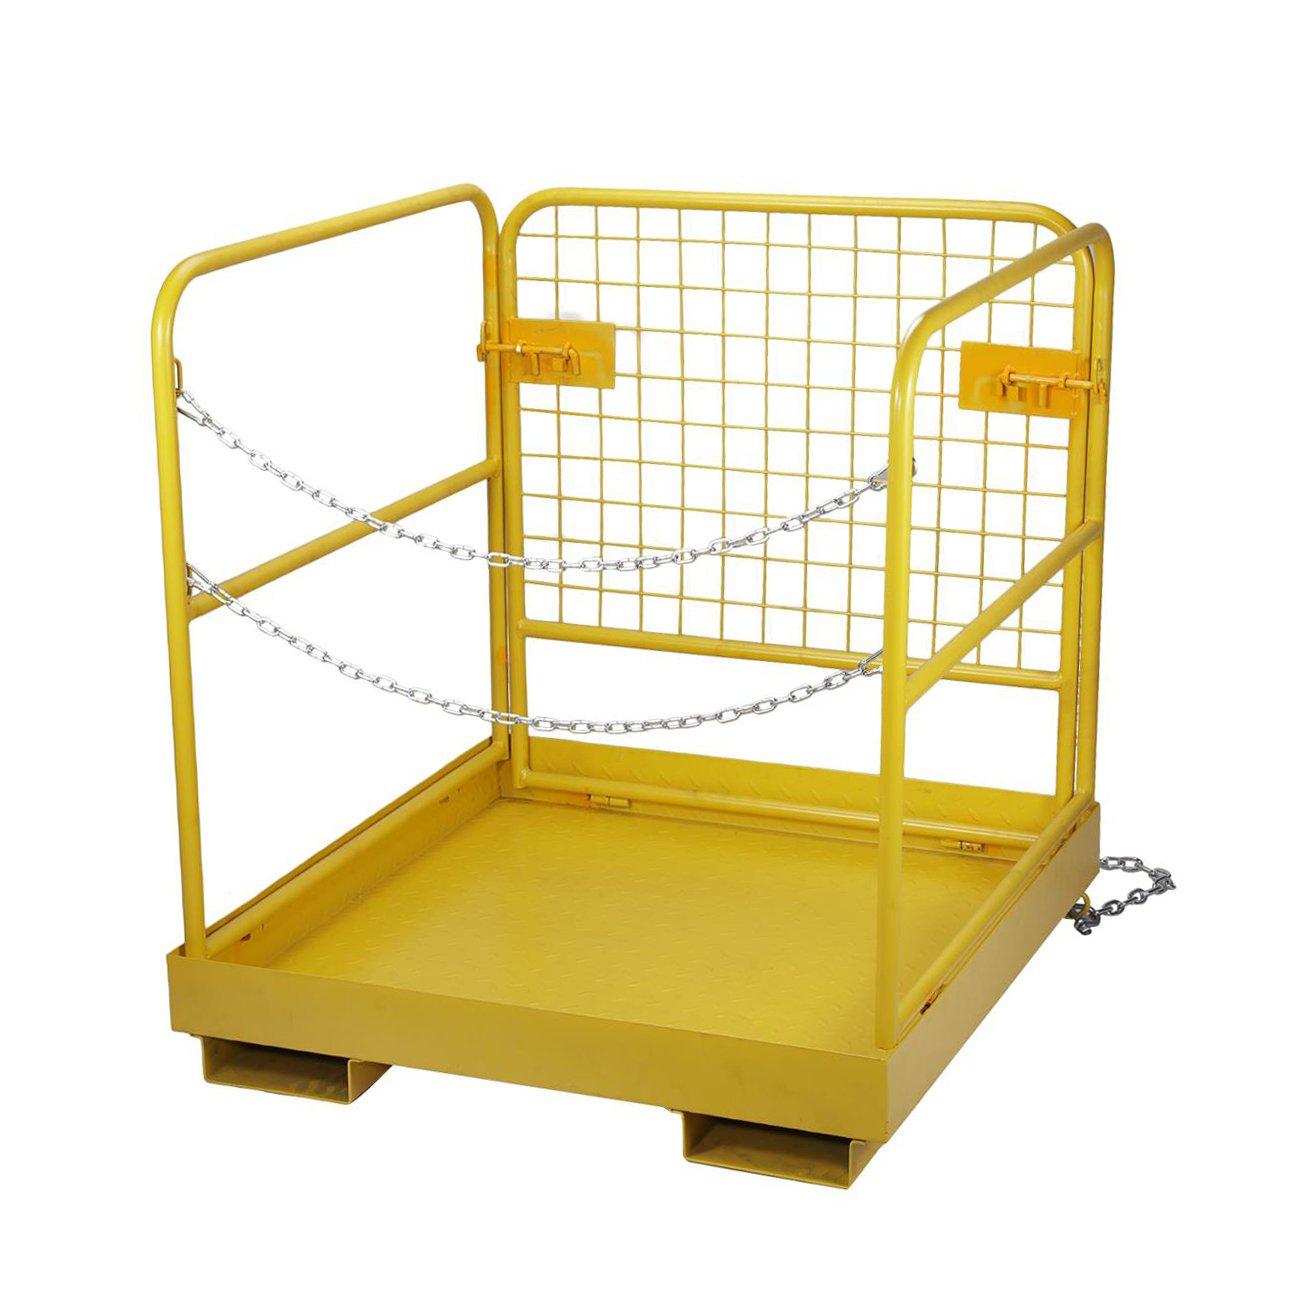 BEAMNOVA Forklift Safety Cage Work Platform Collapsible Lift Basket Aerial Rails 36''x36''